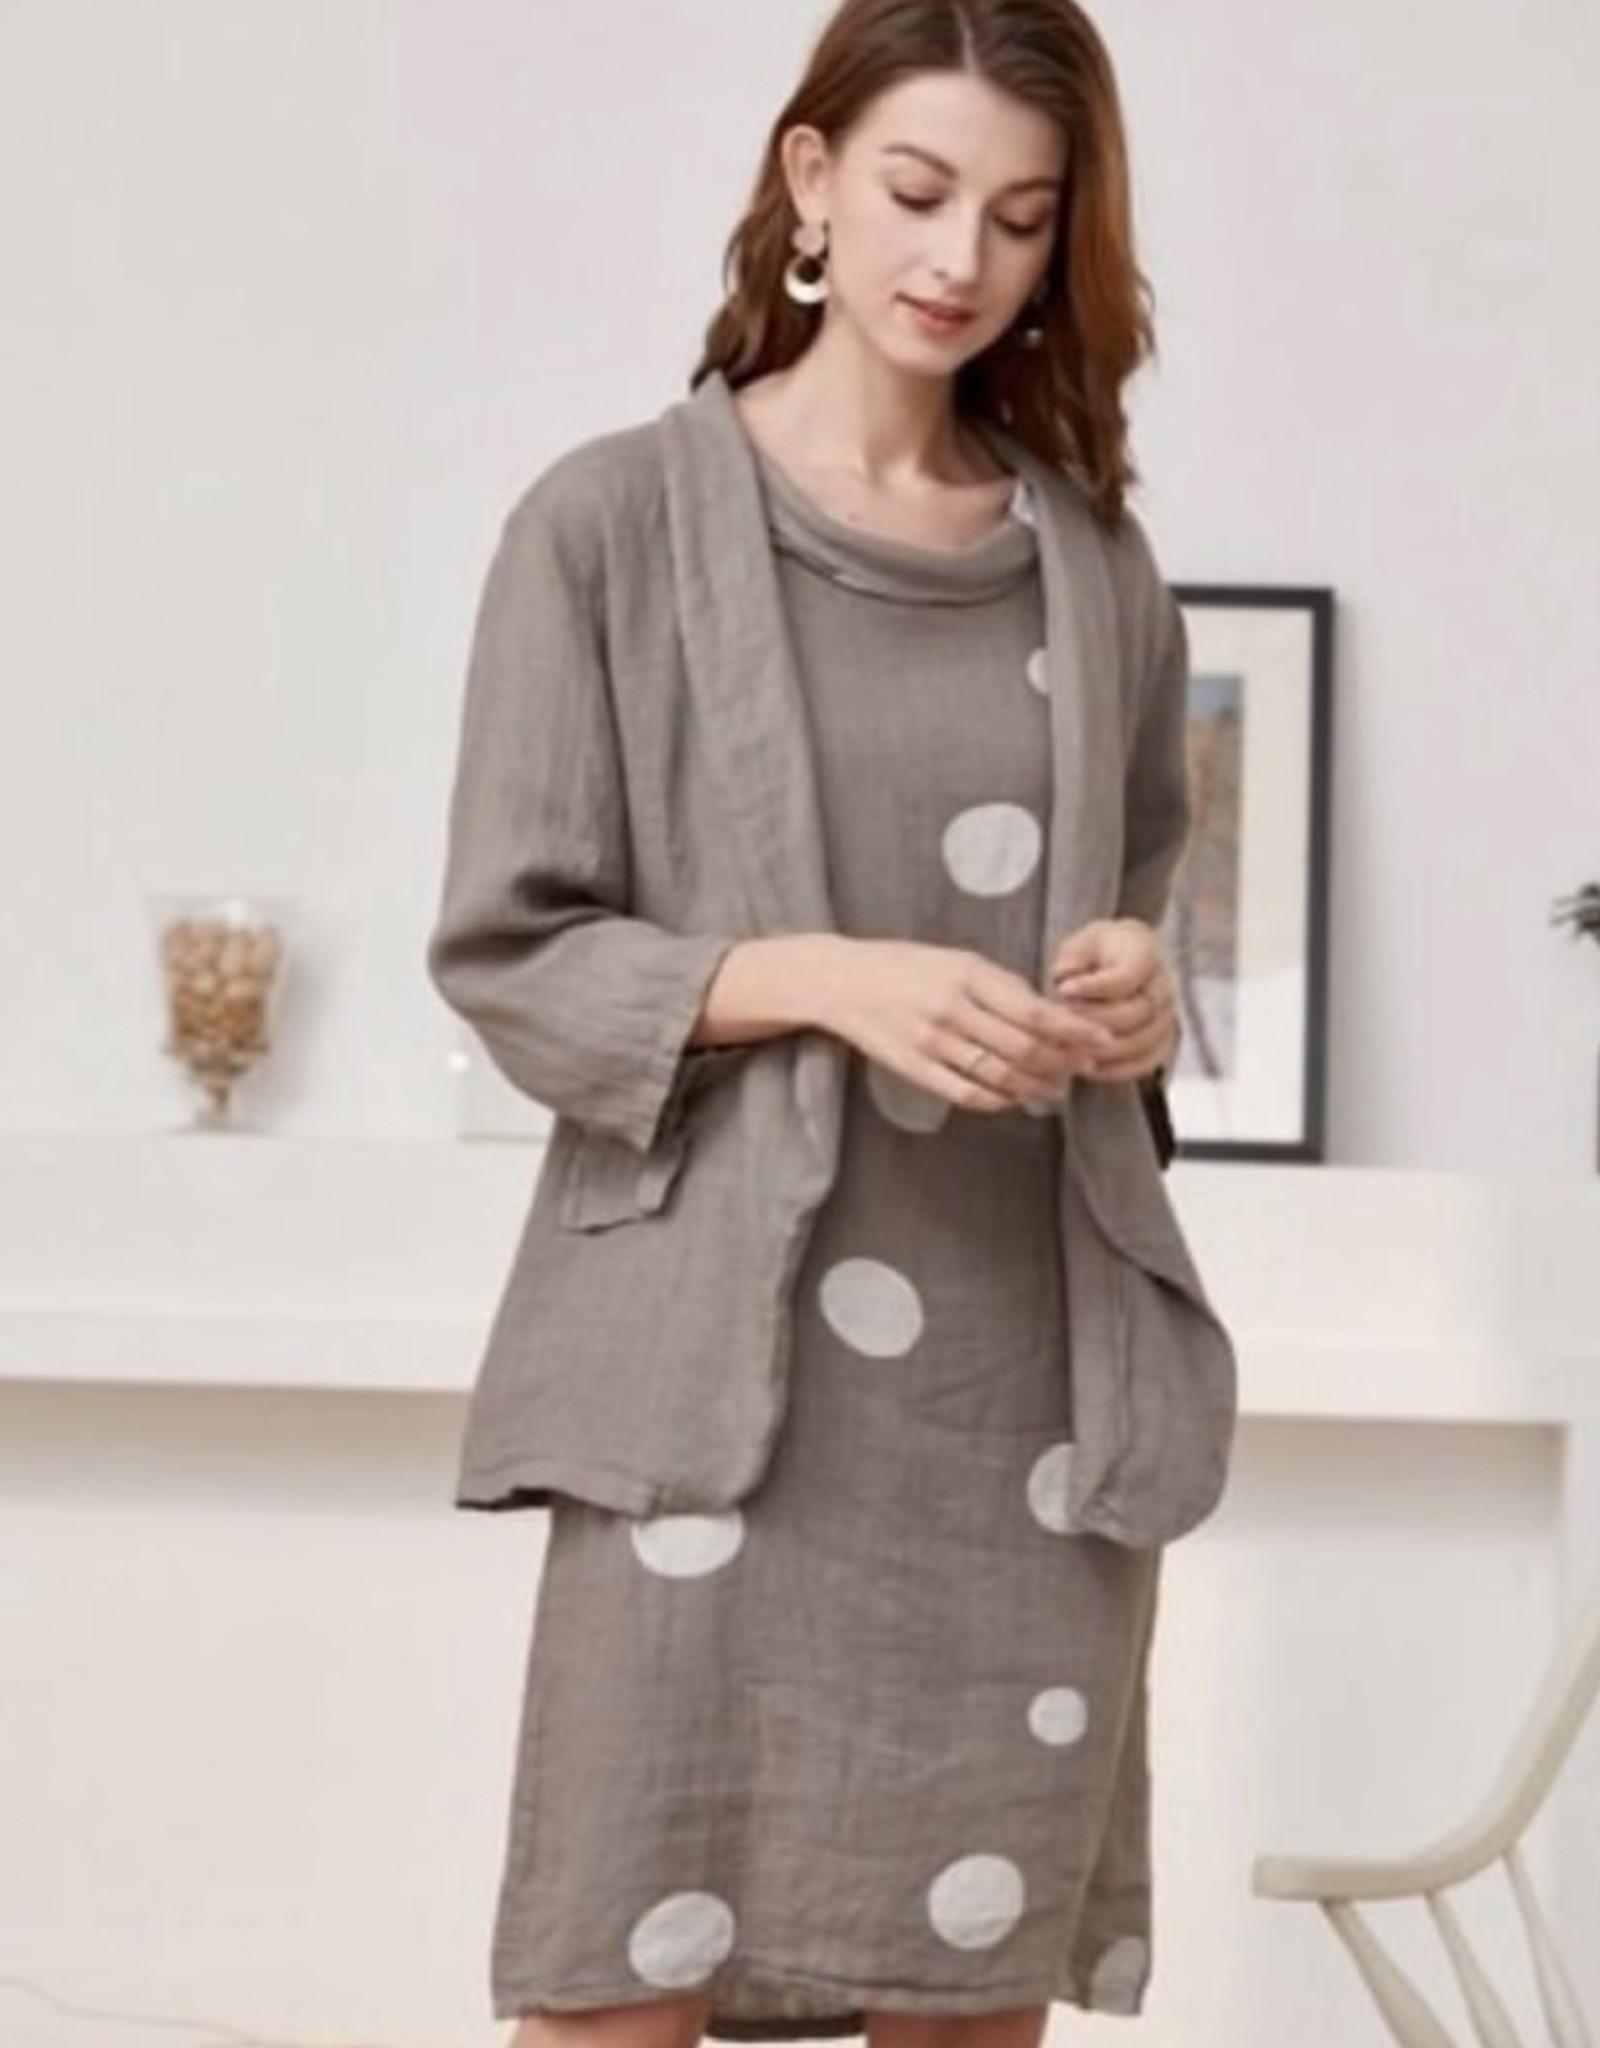 Rosa Jo Jo Linen Shift Dress